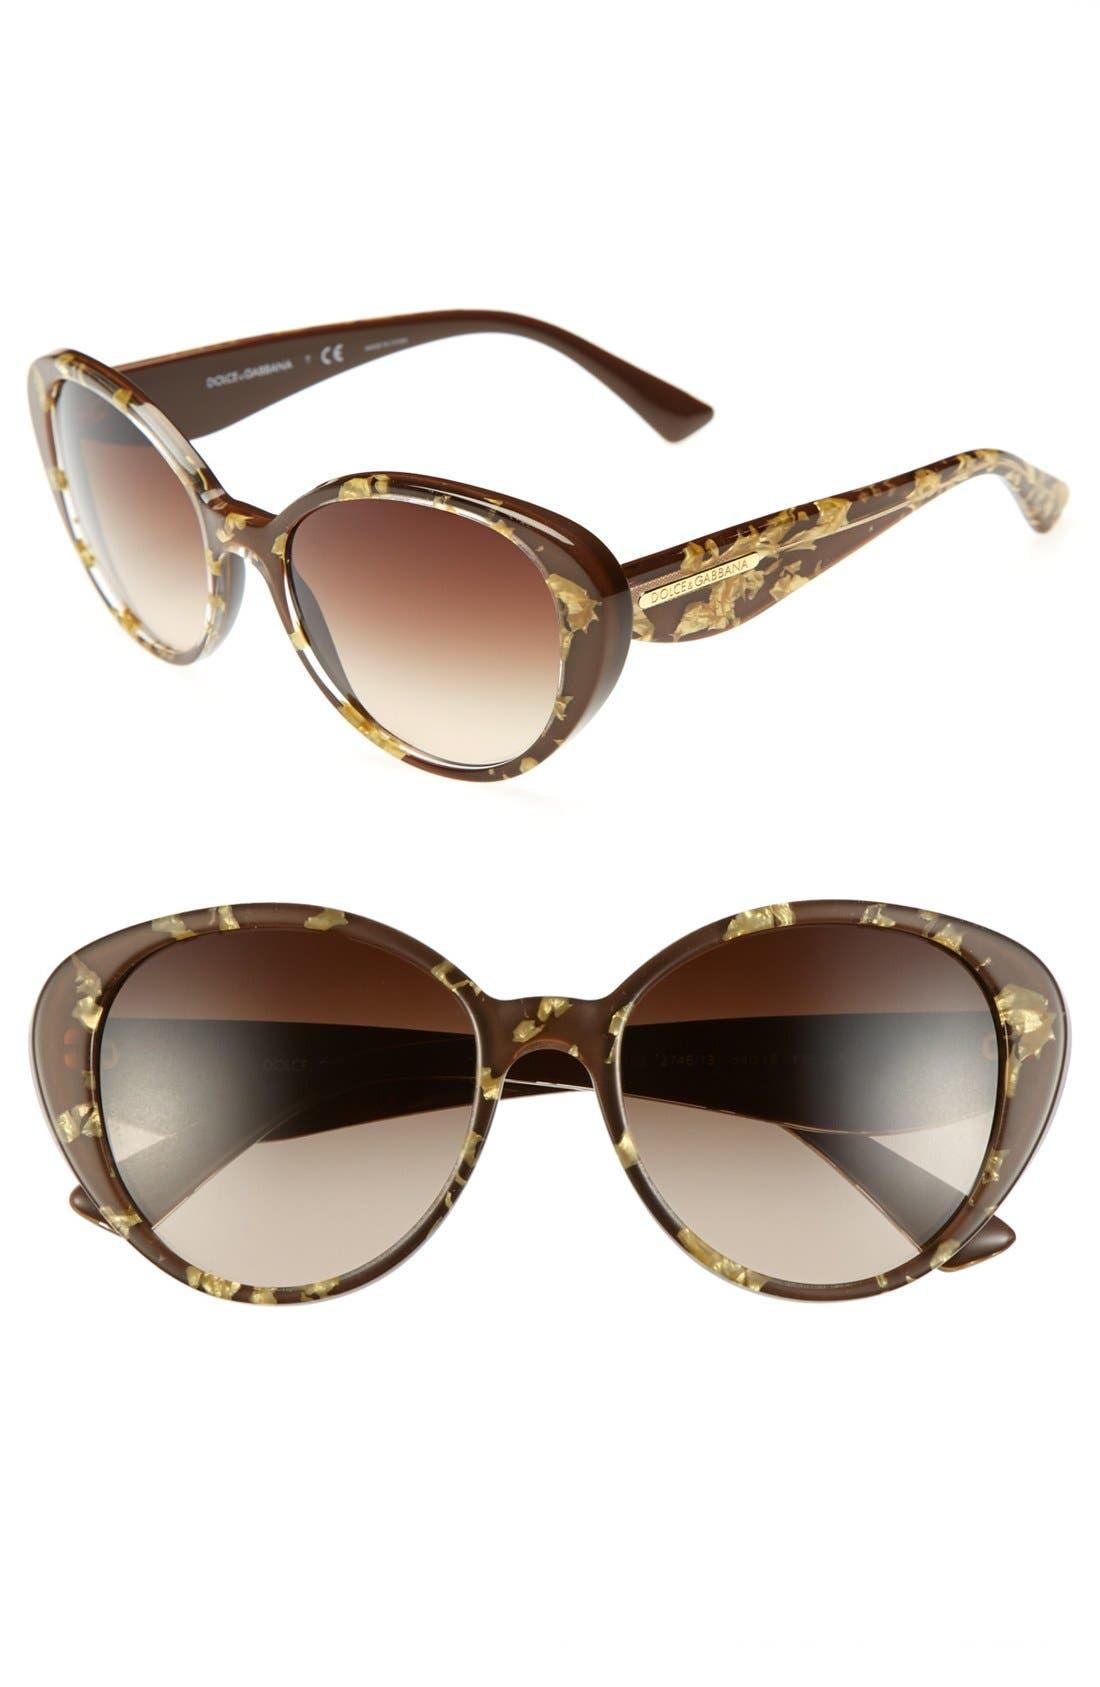 Alternate Image 1 Selected - Dolce&Gabbana 'Gold Leaf' 54mm Sunglasses